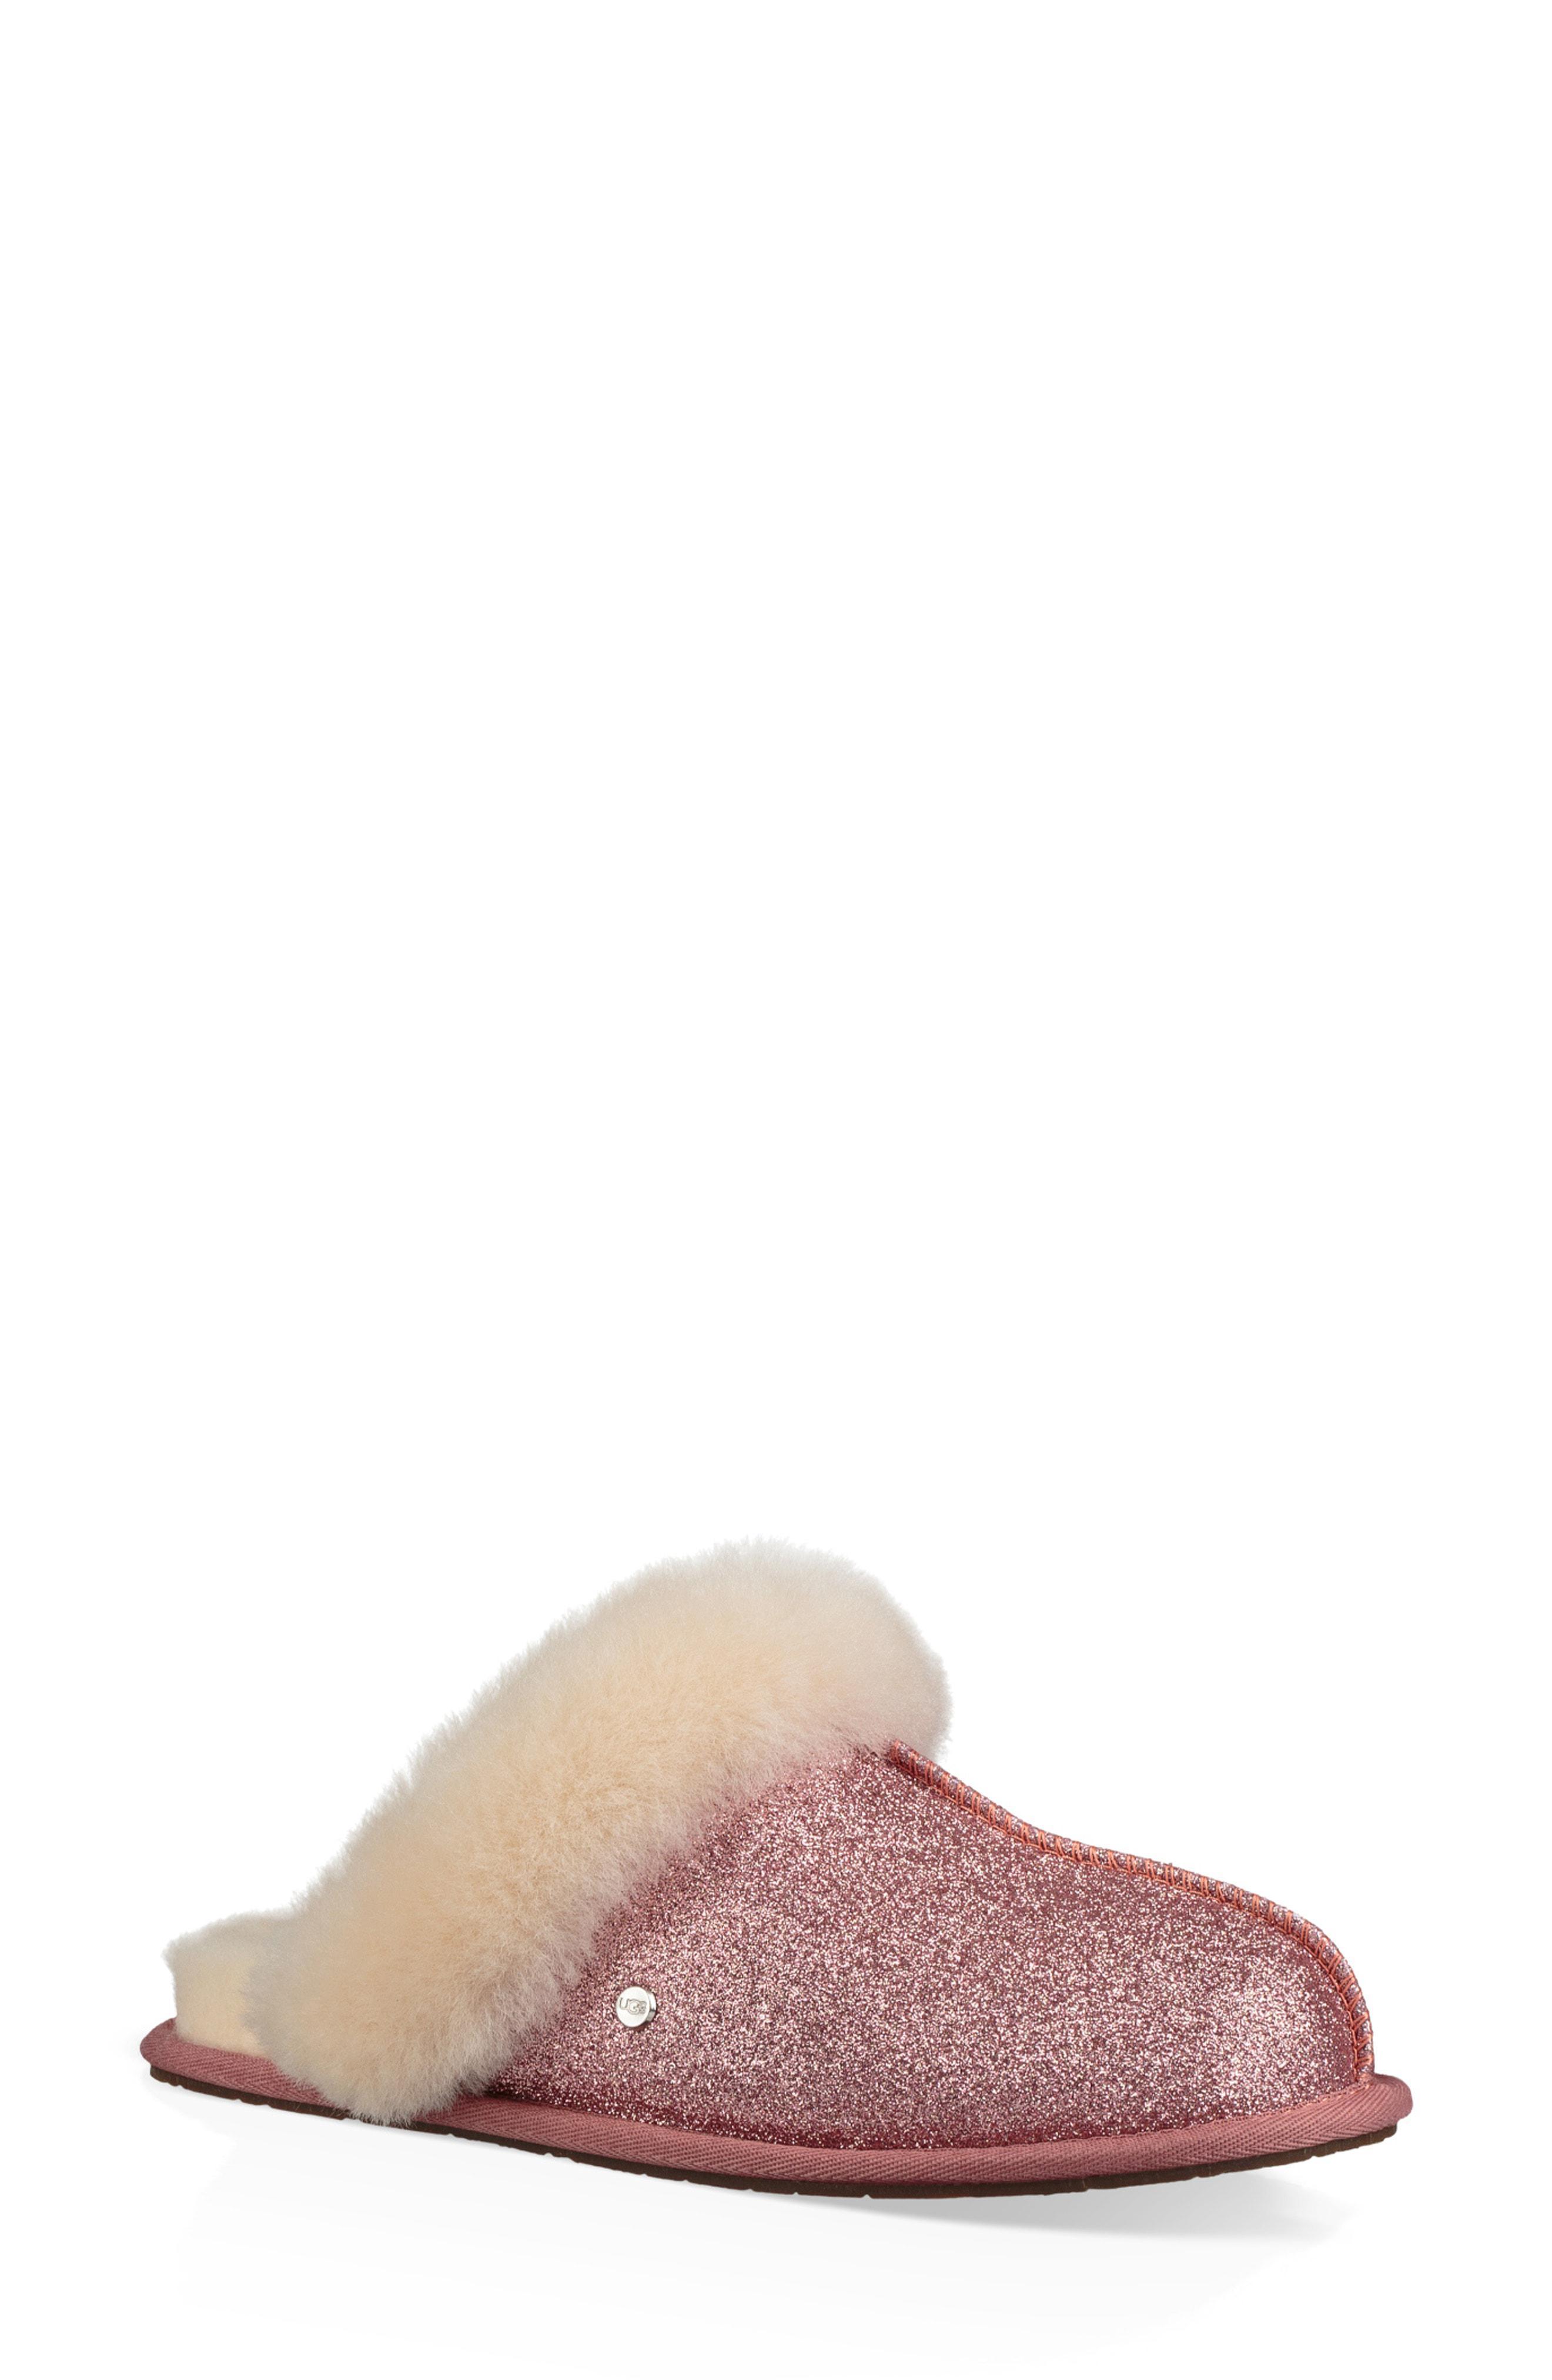 622f05747677 Lyst - UGG Ugg Scuffette Ii Sparkle Genuine Shearling Slipper in Pink